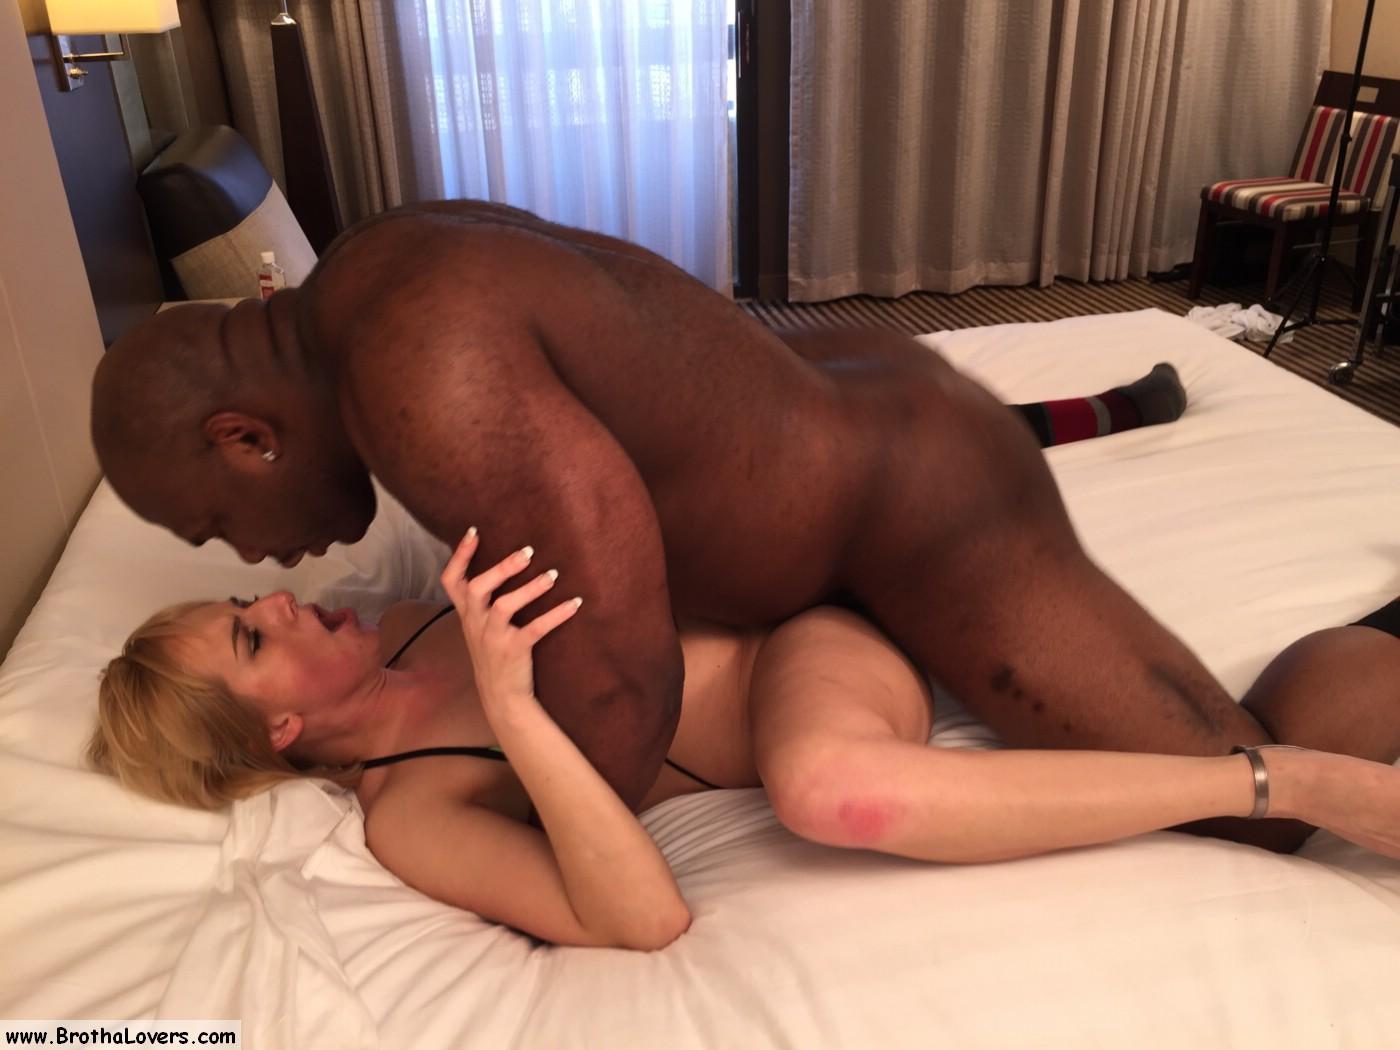 Amateur white girl worships a giant superior bbc - 2 8